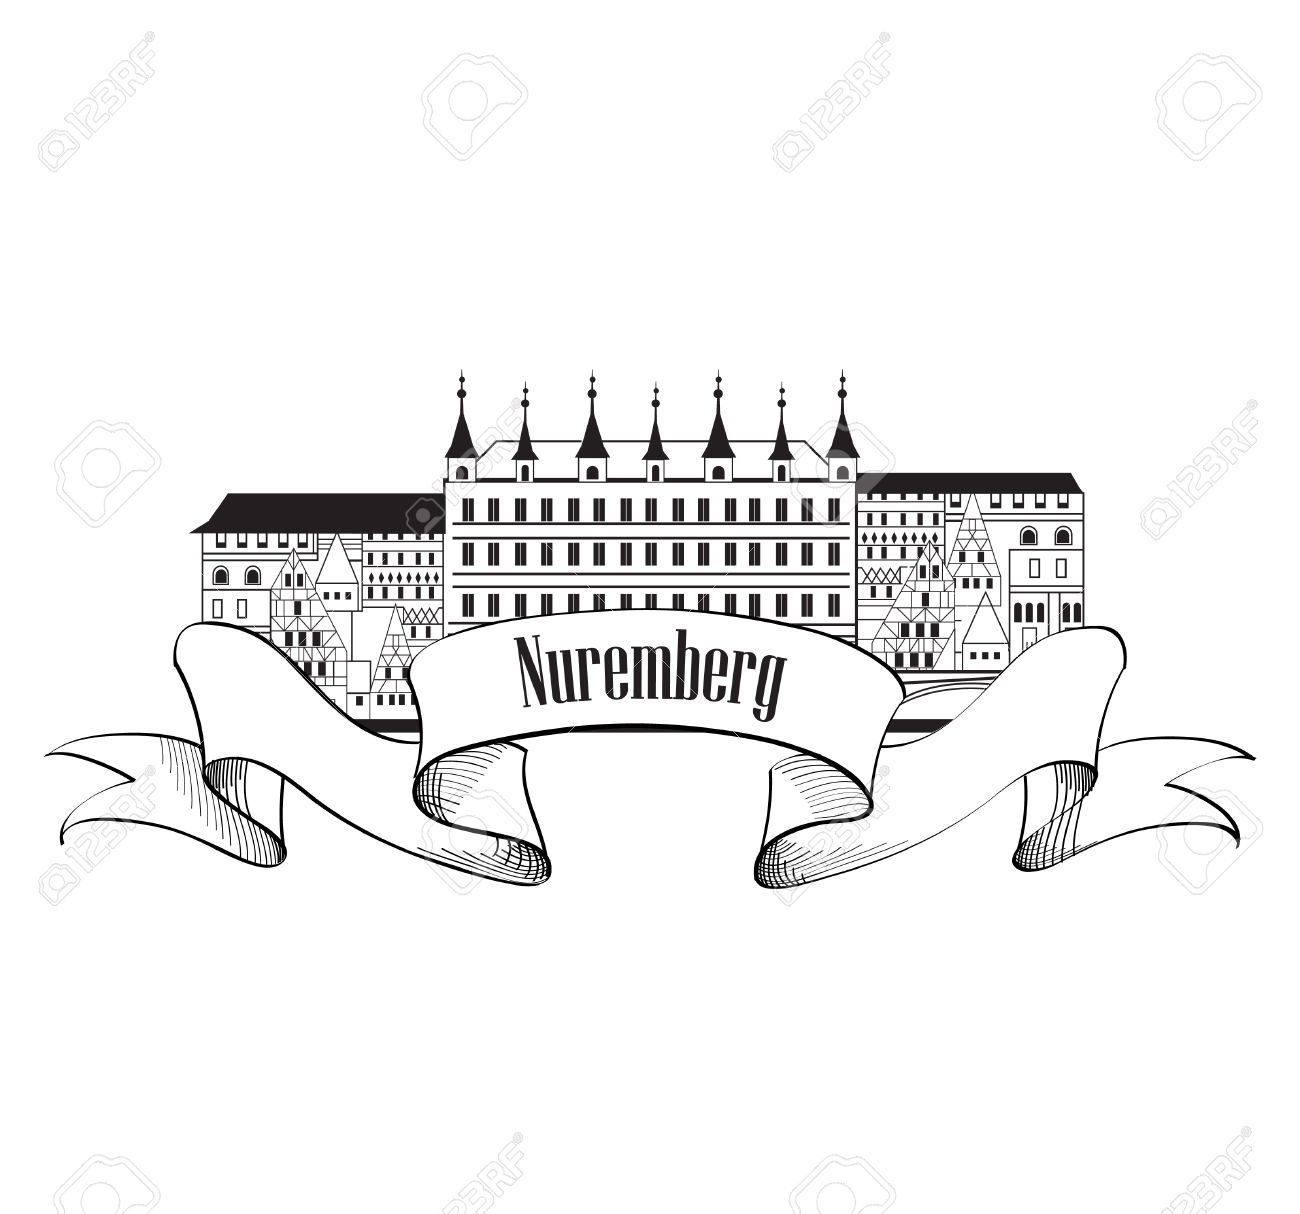 Nuremberg Clipart